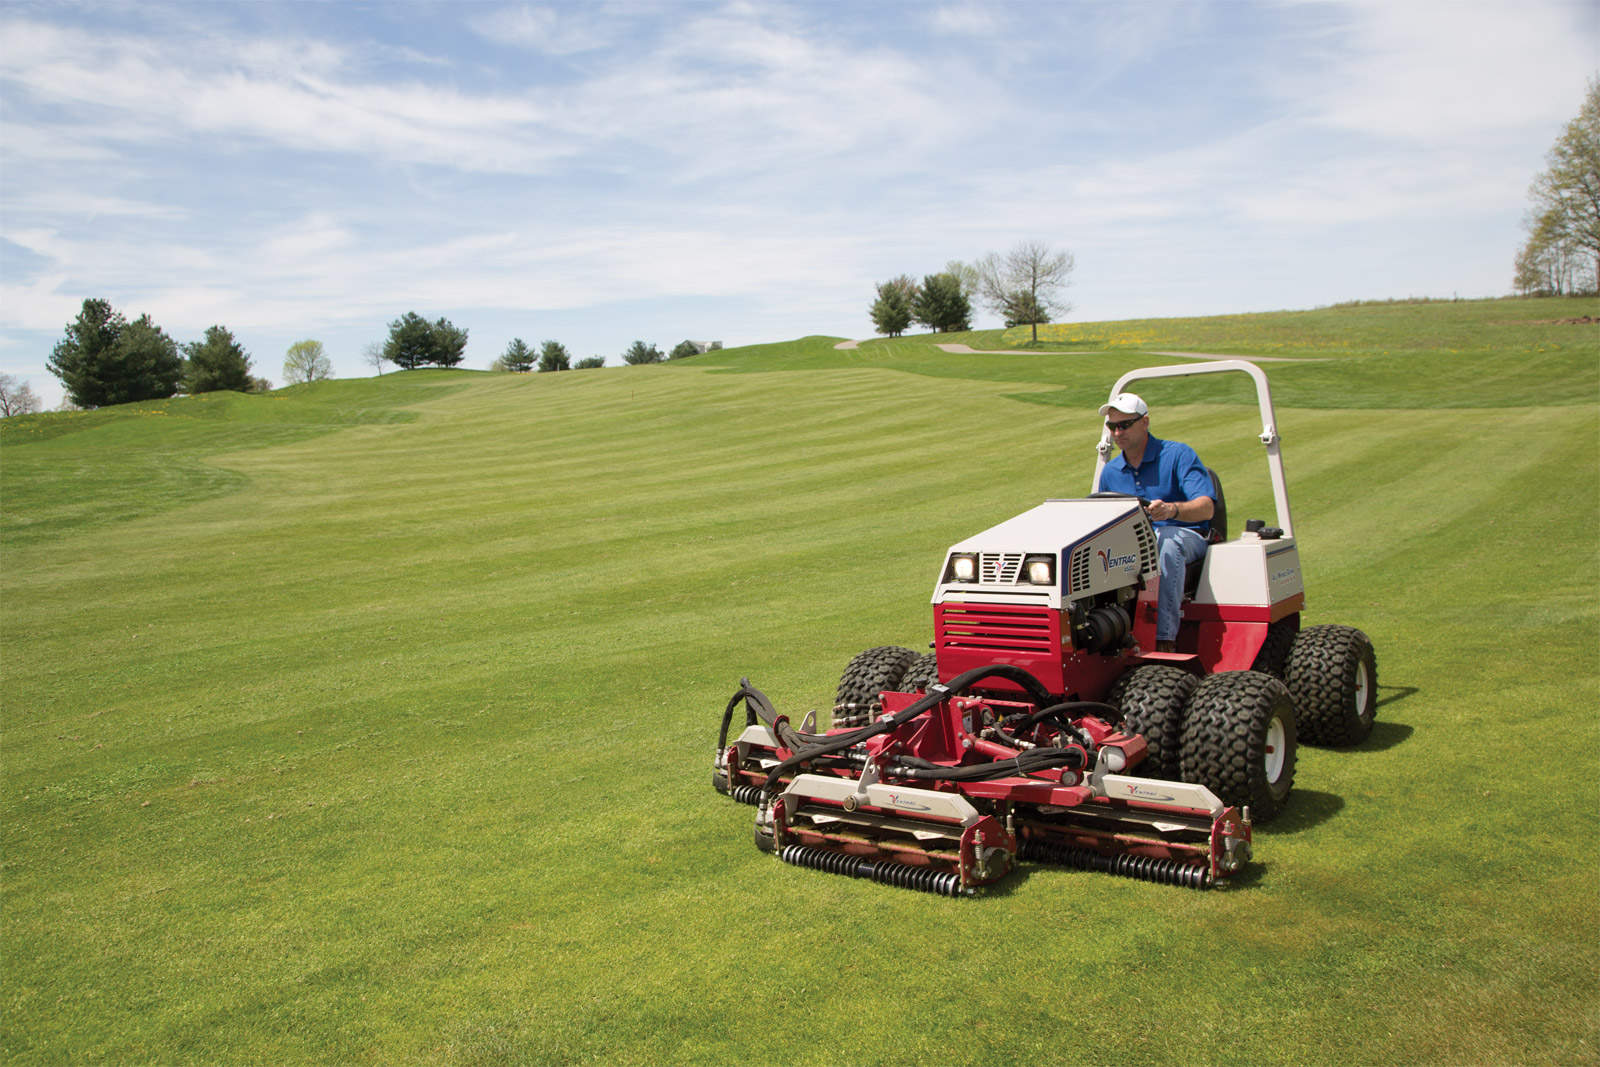 mr740 Tractor